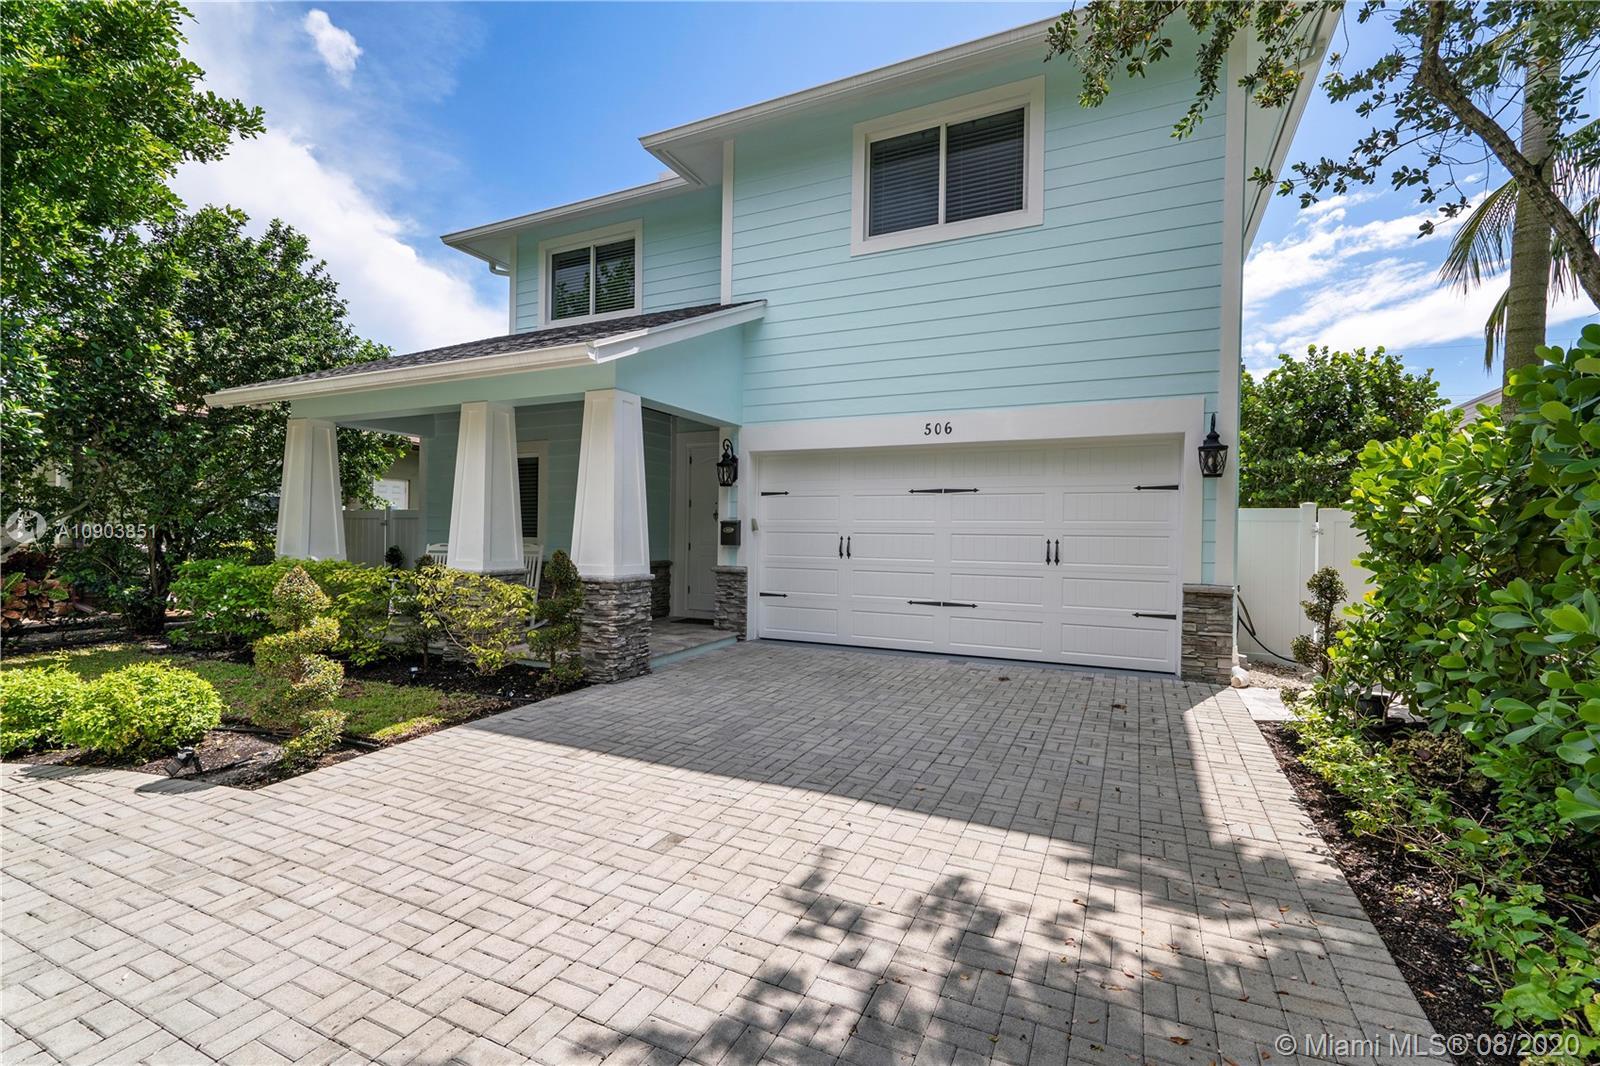 Property for sale at 506 NE 10th Ave, Pompano Beach,  Florida 33060